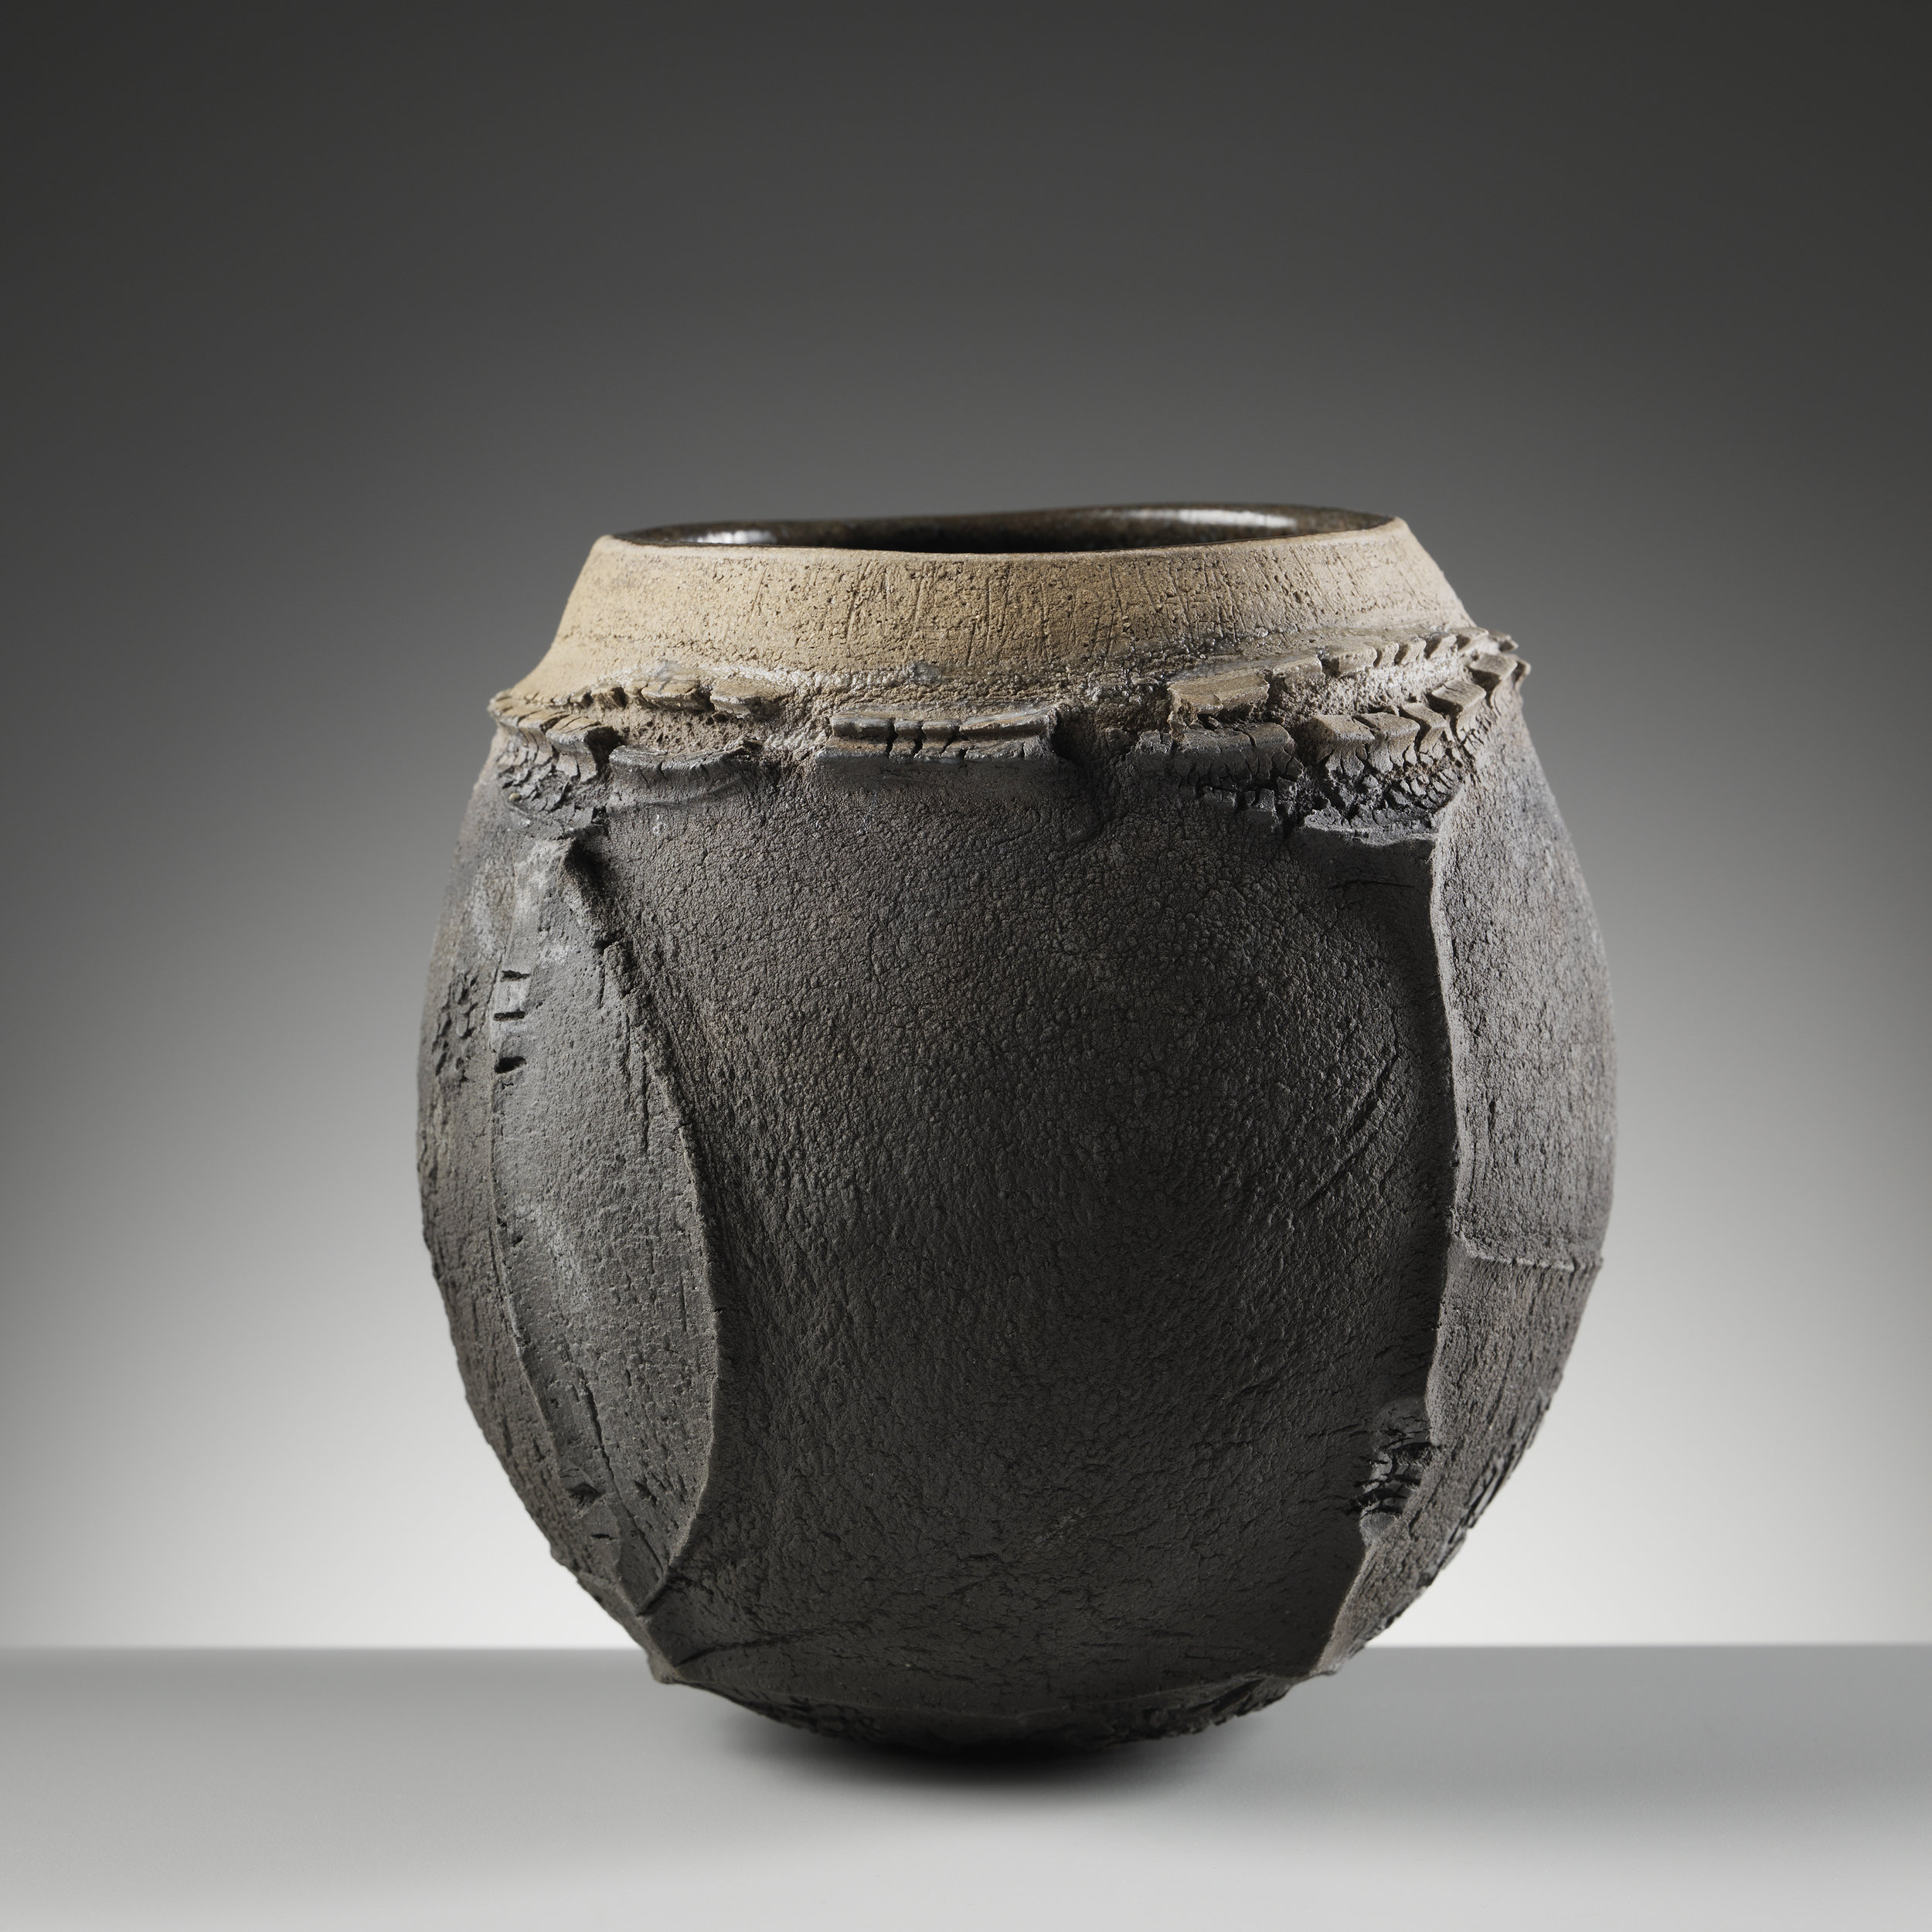 Patricia Shone : Erosion Bowl  [Photo - Shannon Tofts]